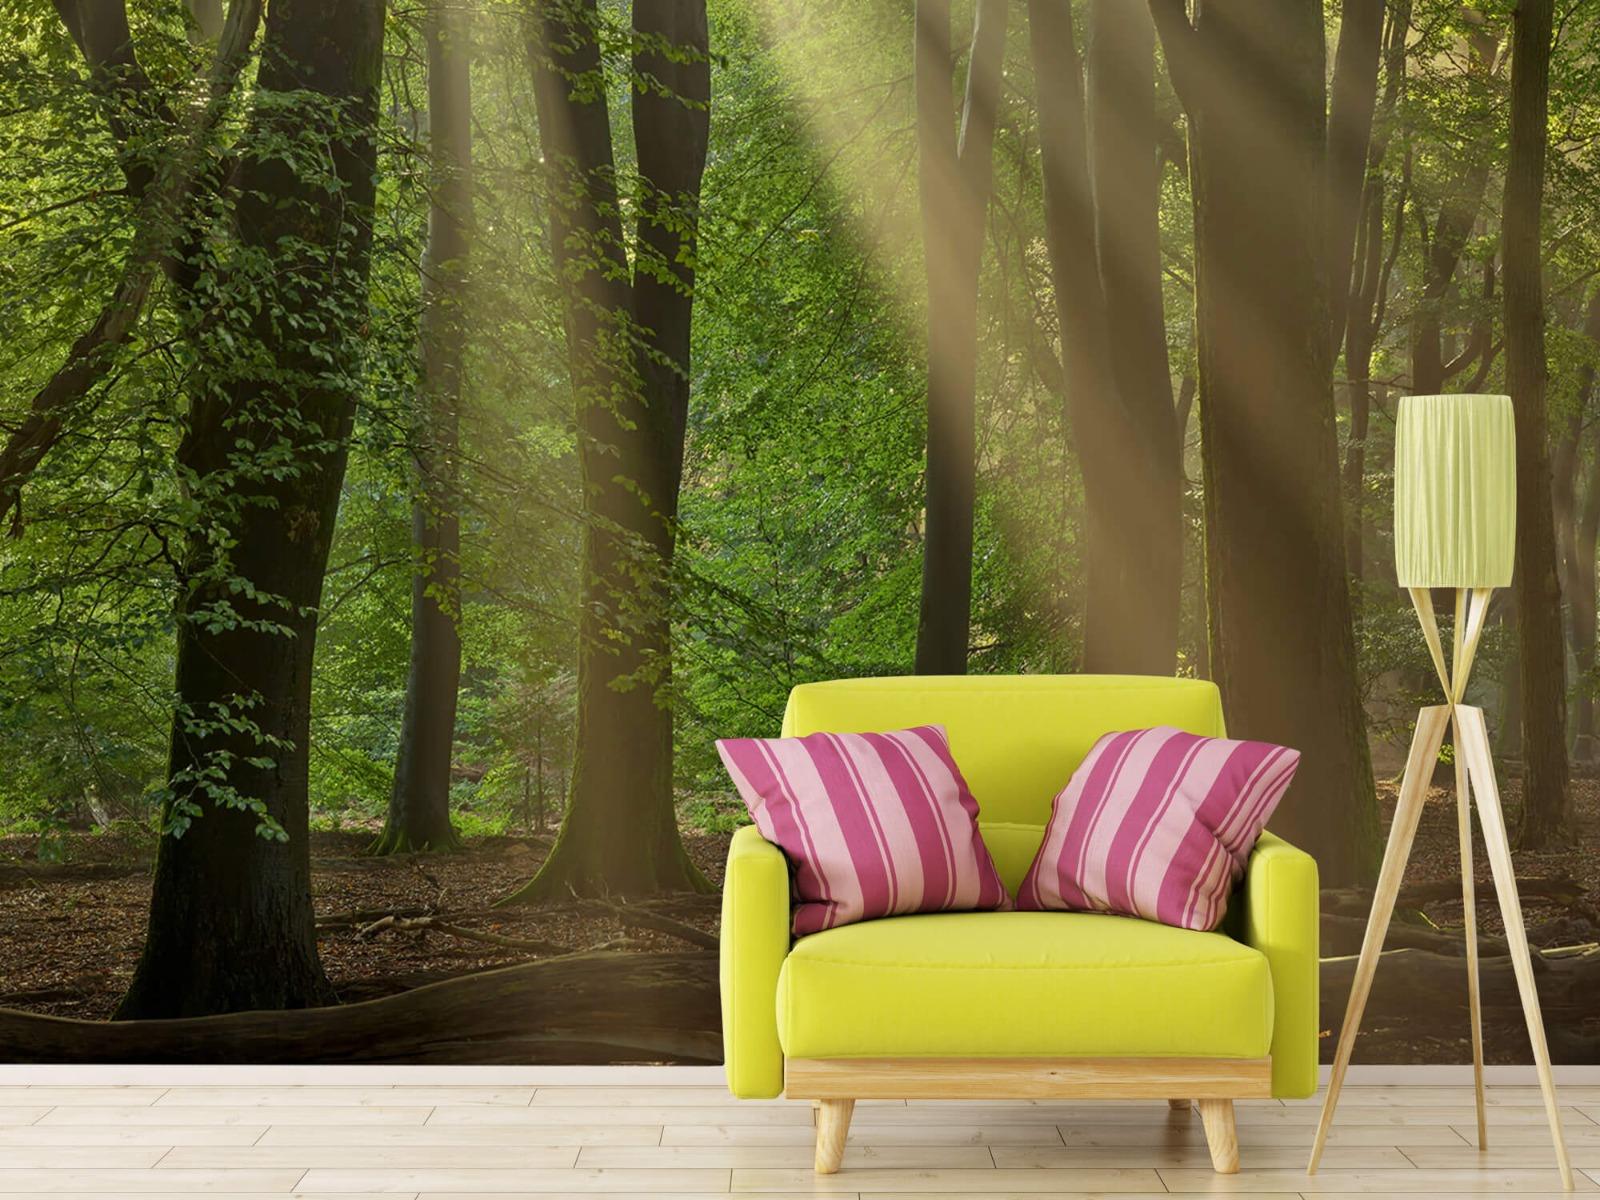 Bomen - Zonneharpen in het bos - Slaapkamer 18